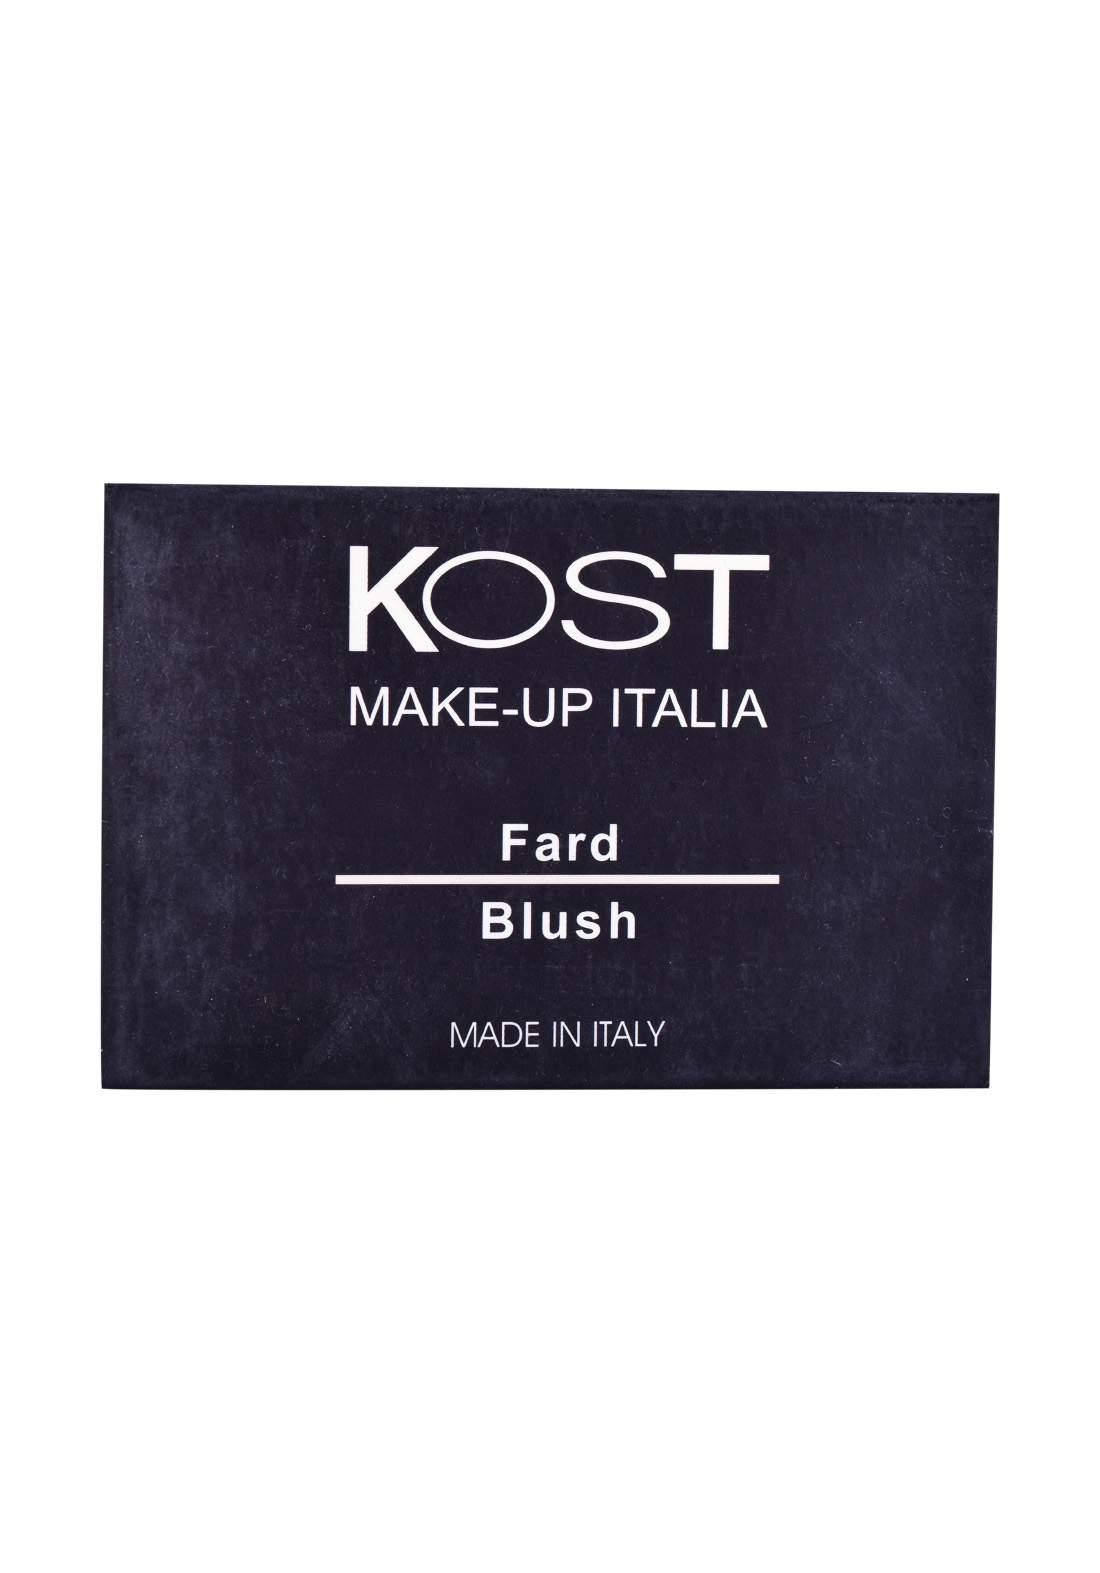 Kost Make Up Italia Fard Blush No.33 احمر خدود